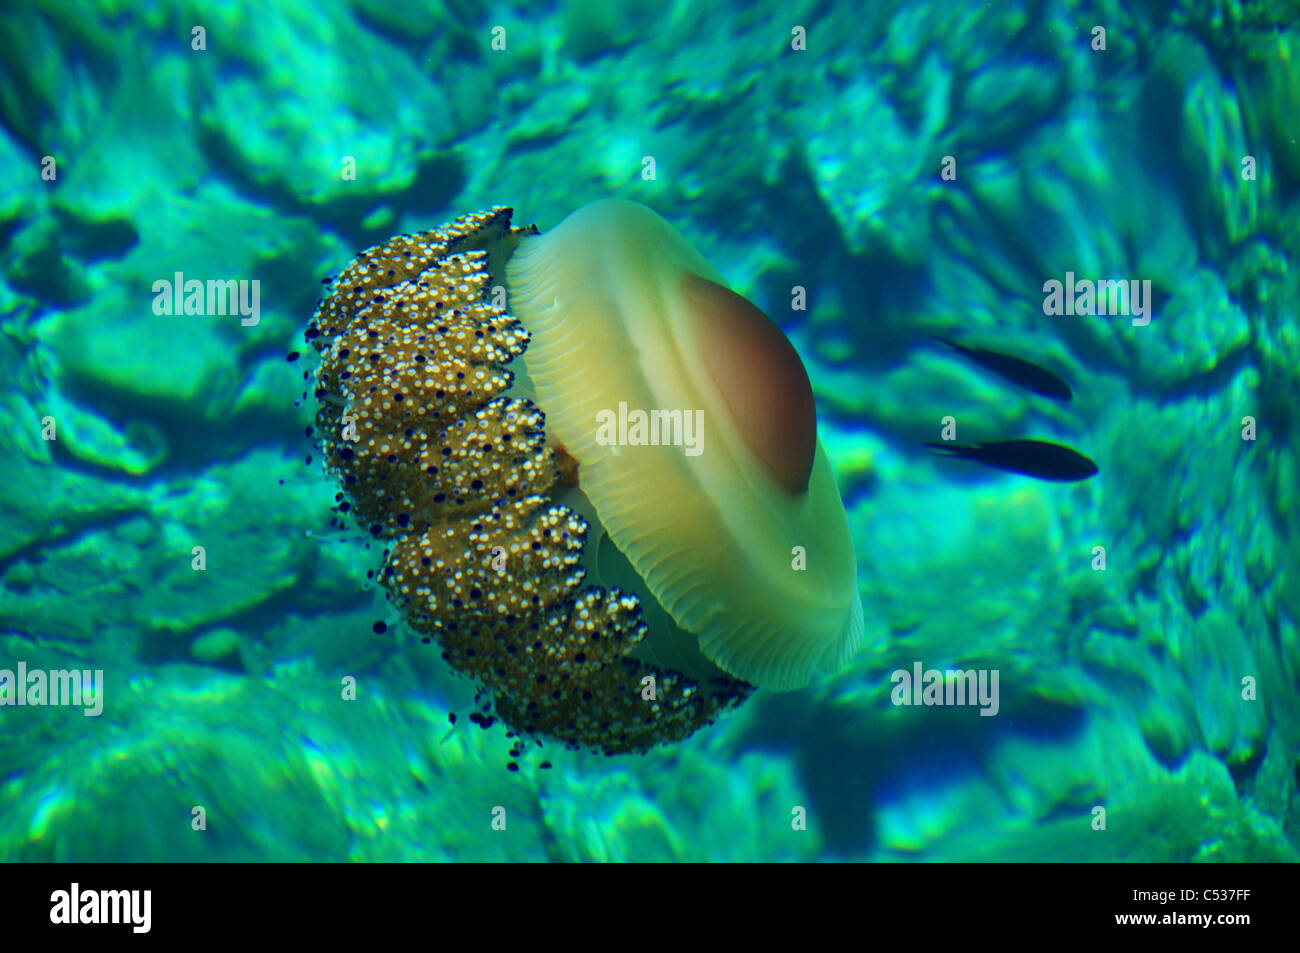 Mediterranean jellyfish - Stock Image